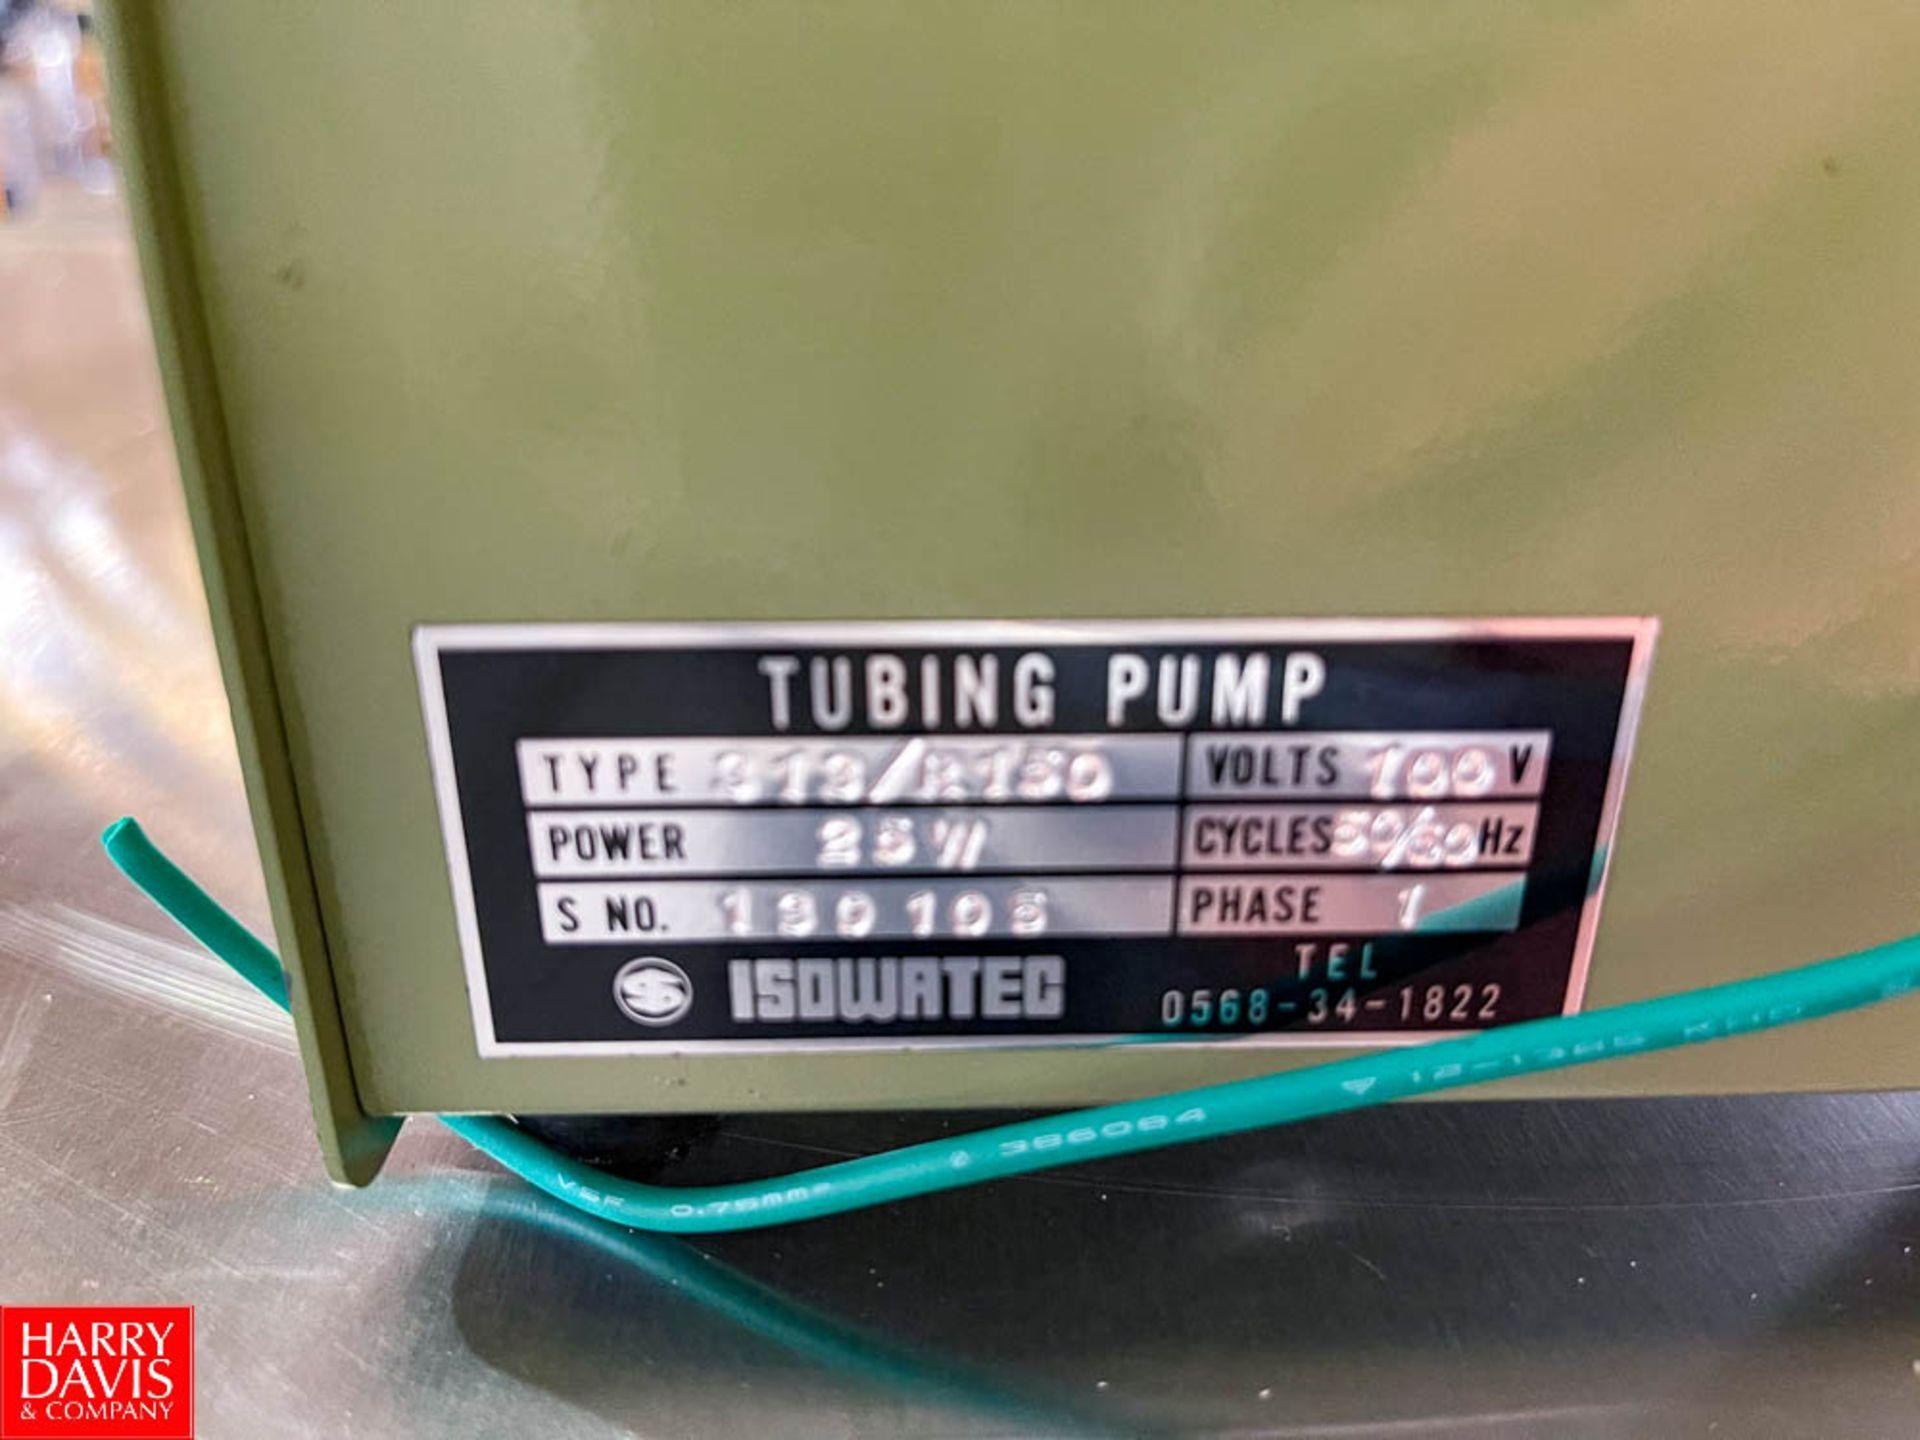 Watson Marlow Peristaltic Tubing Pump Model 313/R150 - Image 2 of 2